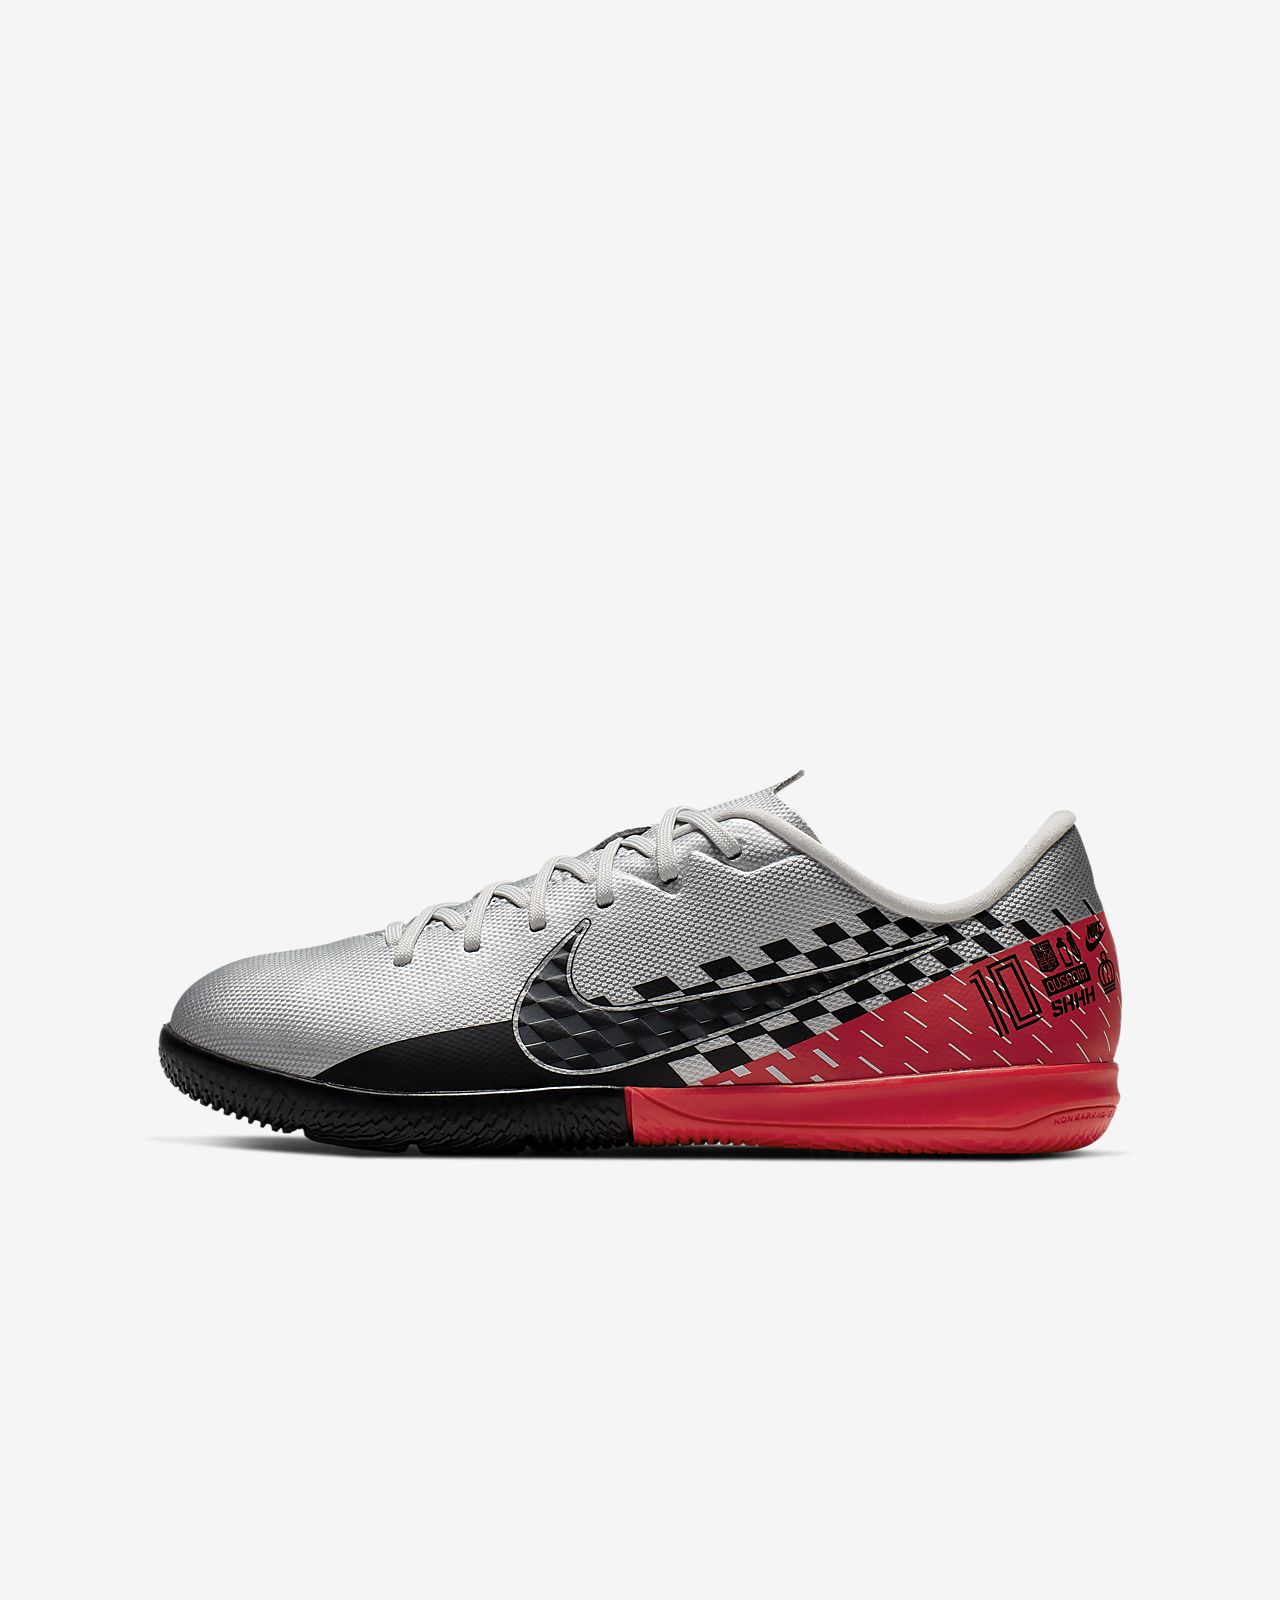 botas futbol sala niño nike mercurial, Nike hombre calzado